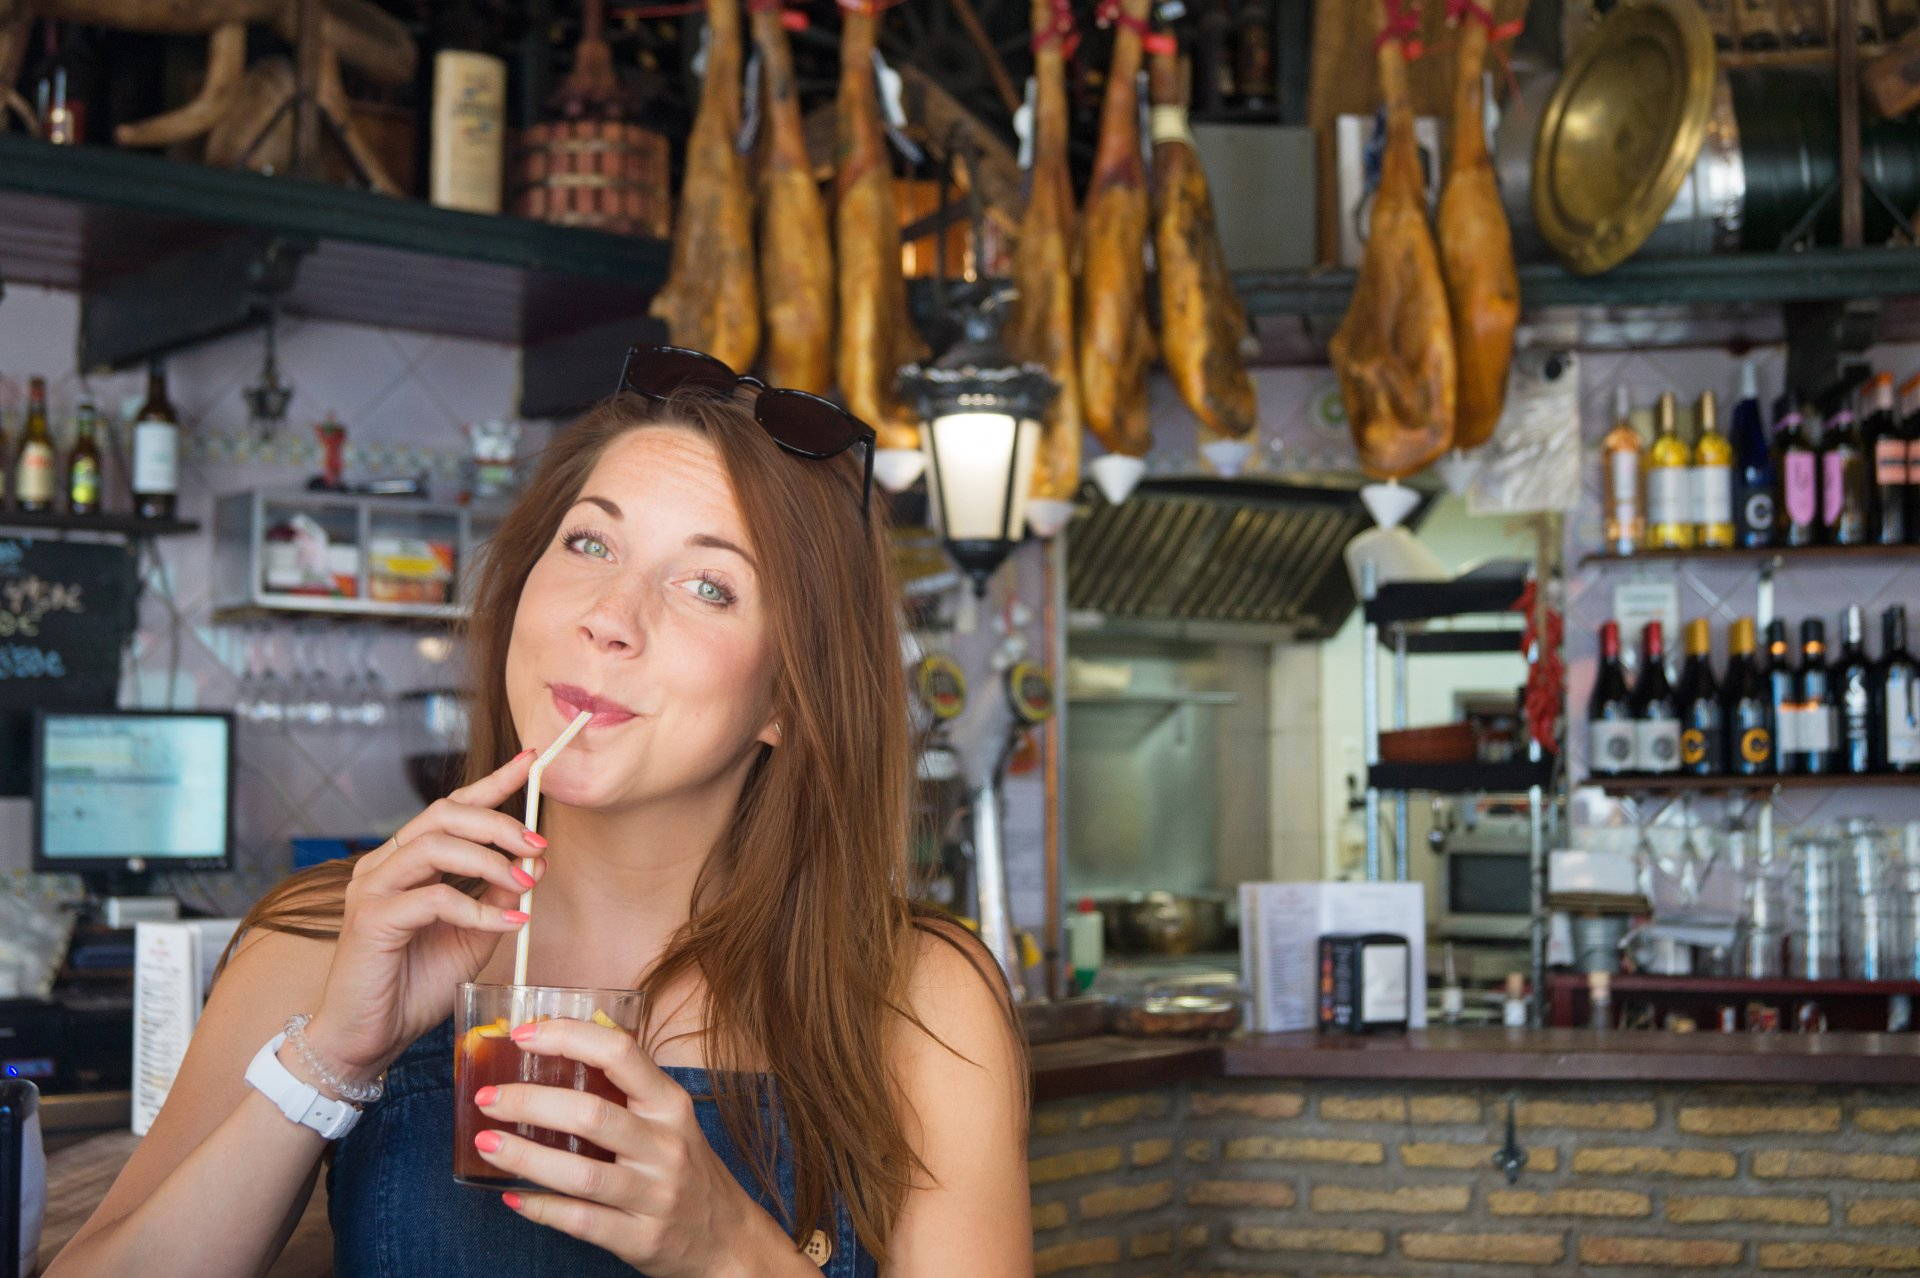 Sangria drinken in authentieke tapasbar in Sevilla